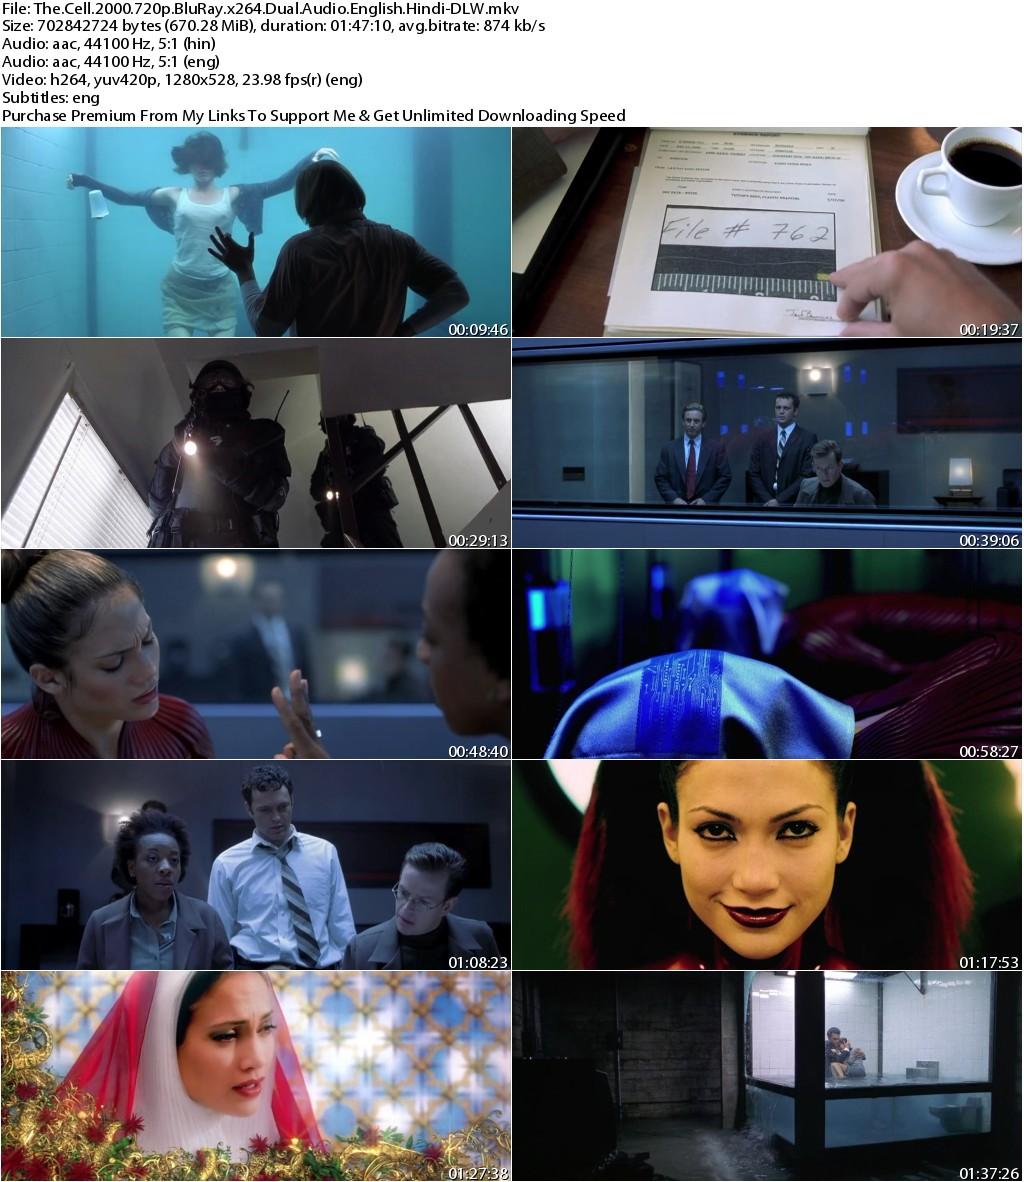 The Cell (2000) 720p BluRay x264 Dual Audio English Hindi-DLW